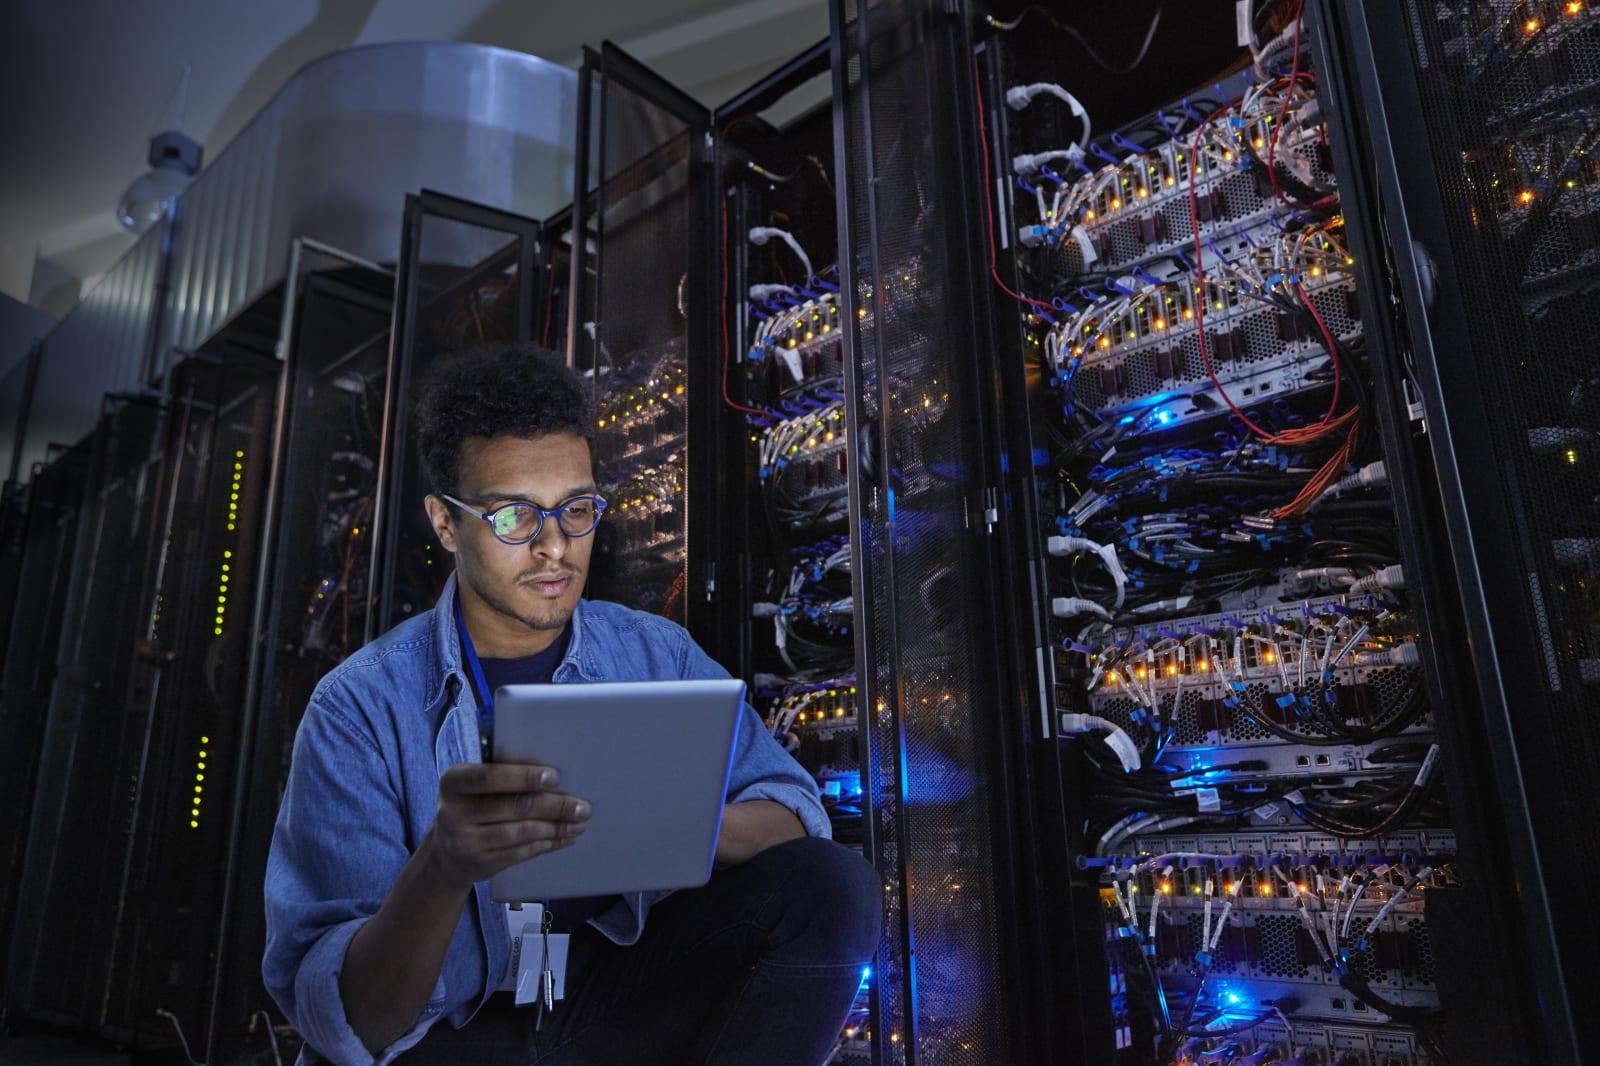 Focused male IT technician using digital tablet in dark server room